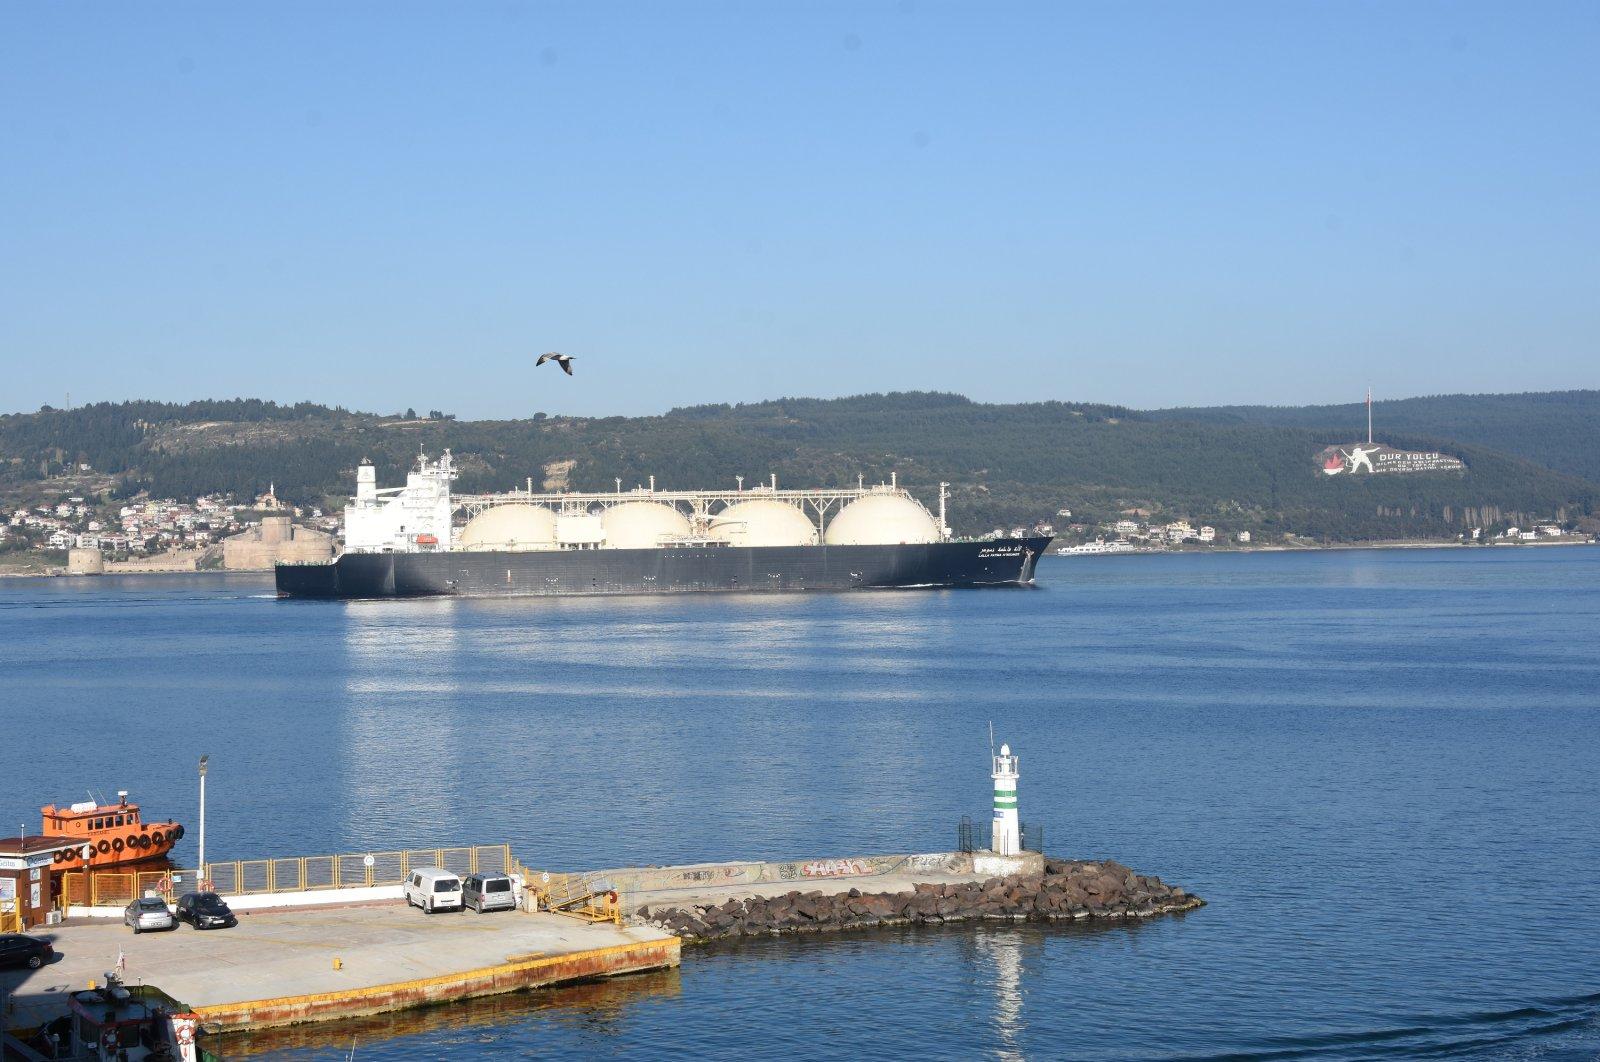 An LNG tanker passes through Çanakkale Strait, Turkey, April 25, 2020. (DHA Photo)